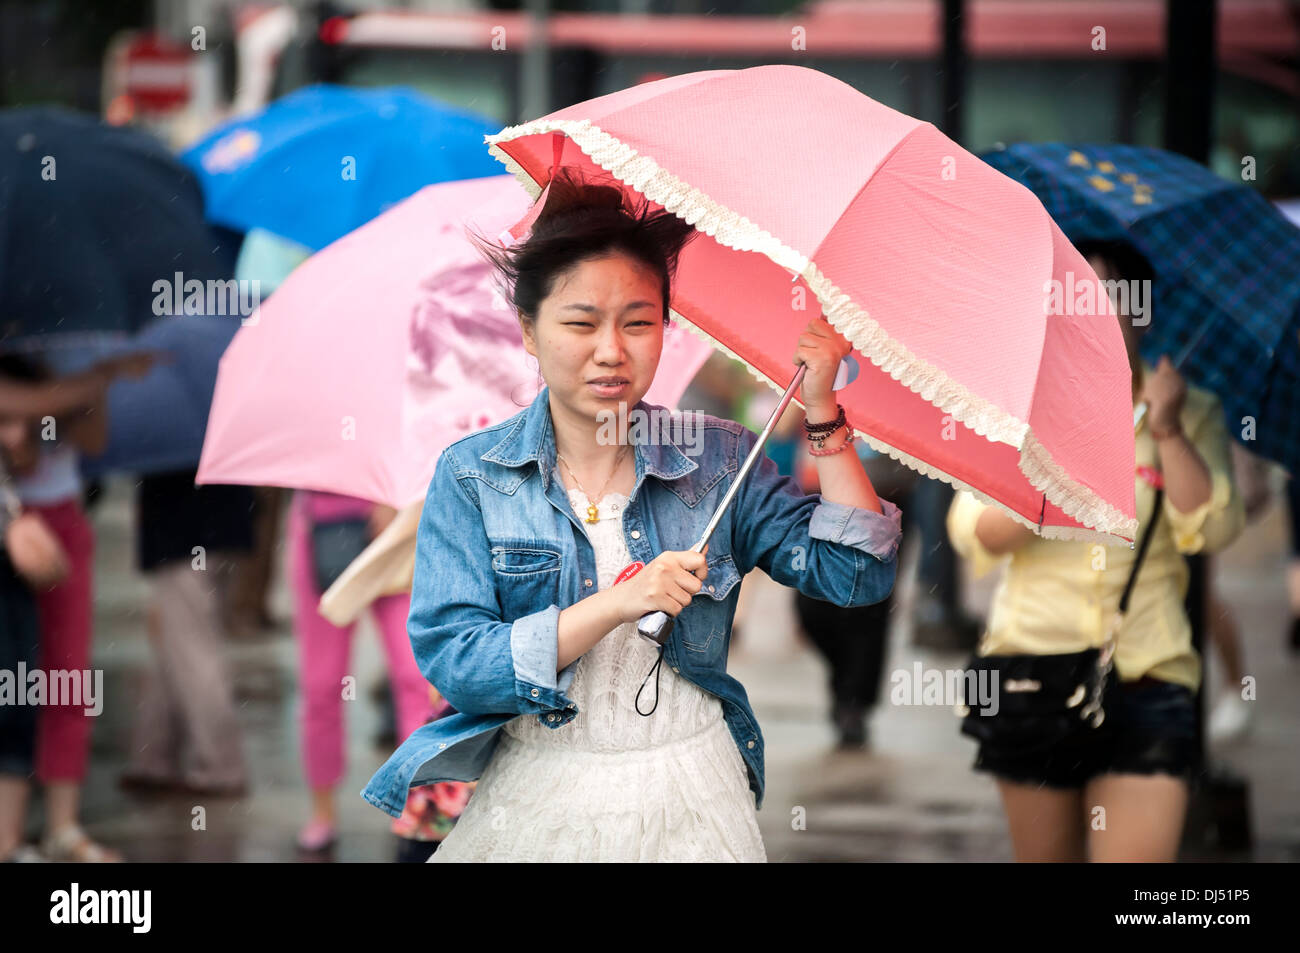 A girl carrying an umbrella during a tropical storm in Hong Kong Stock Photo